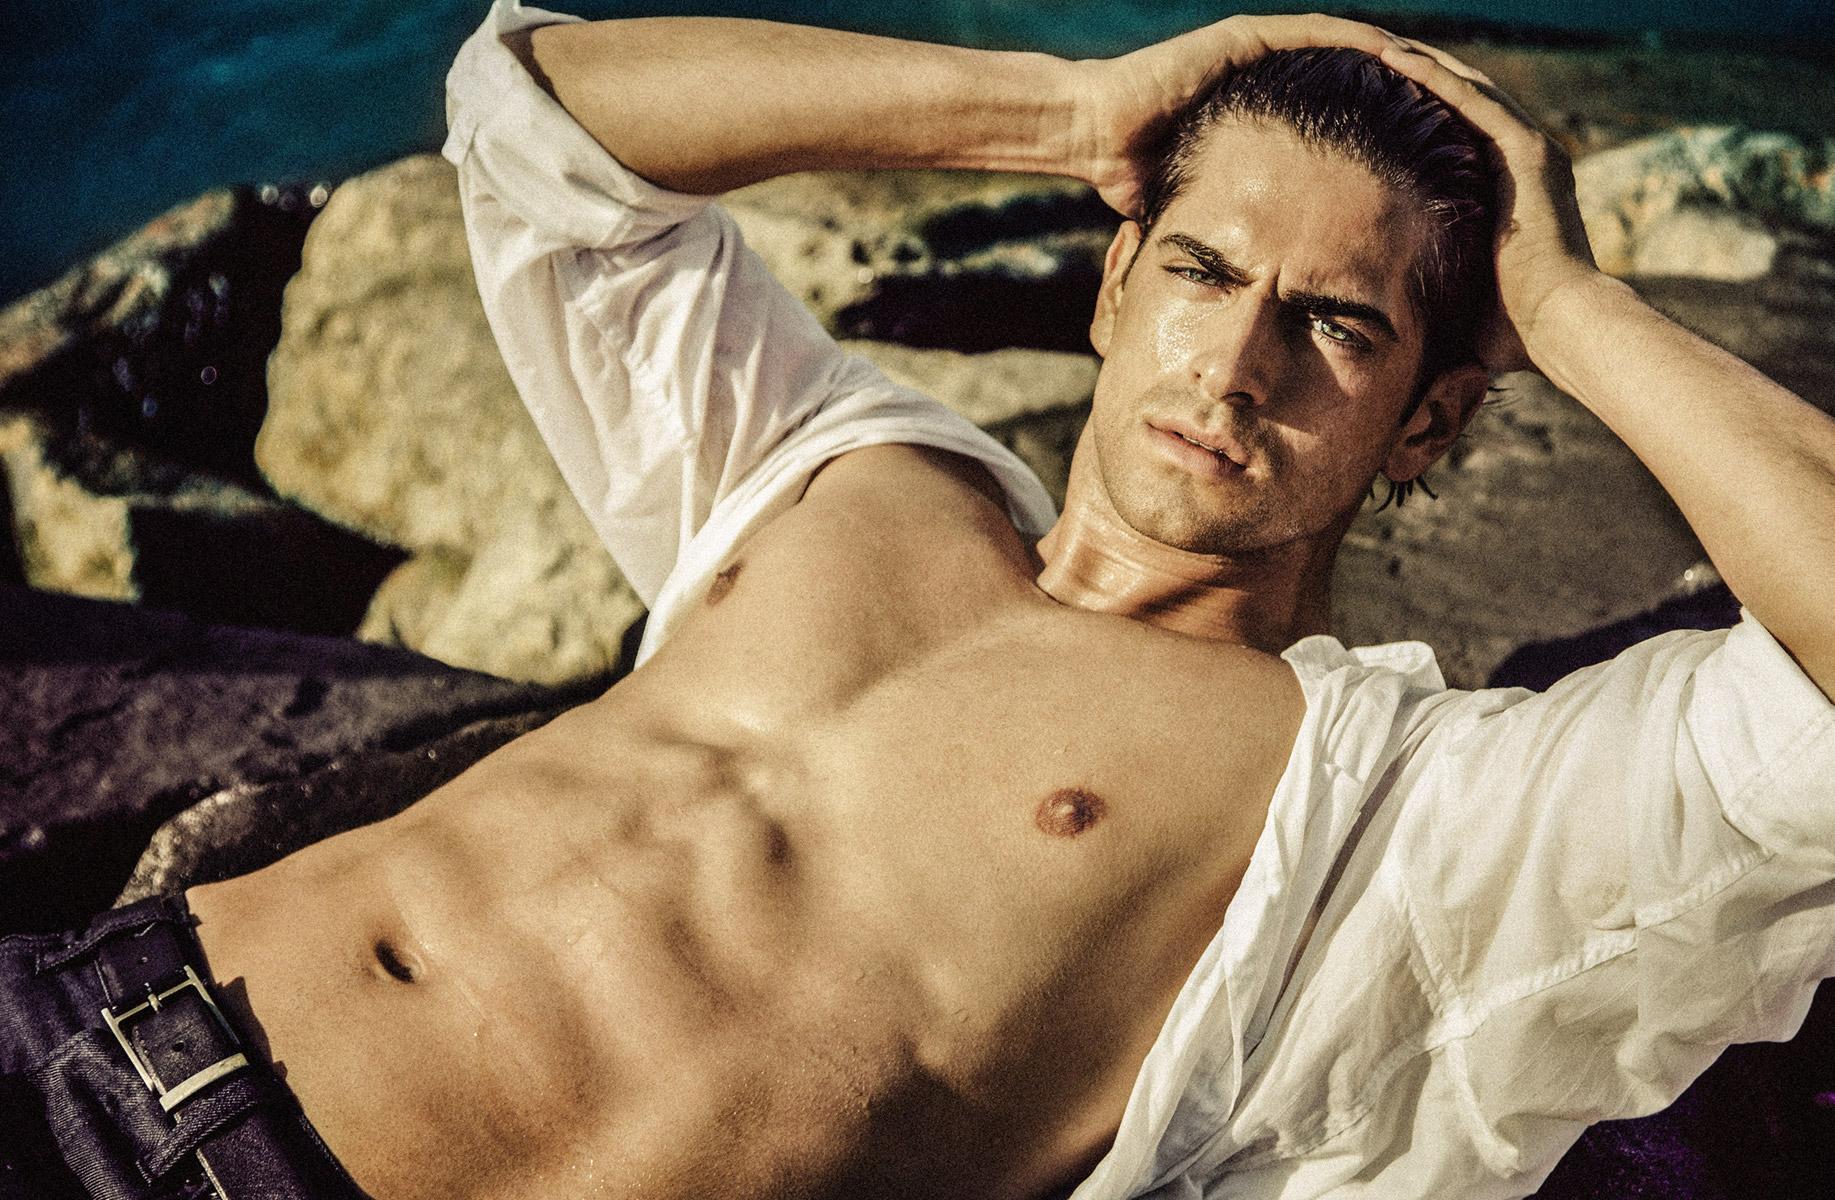 new-mexico-albuquerque-male-models-men-25.jpg